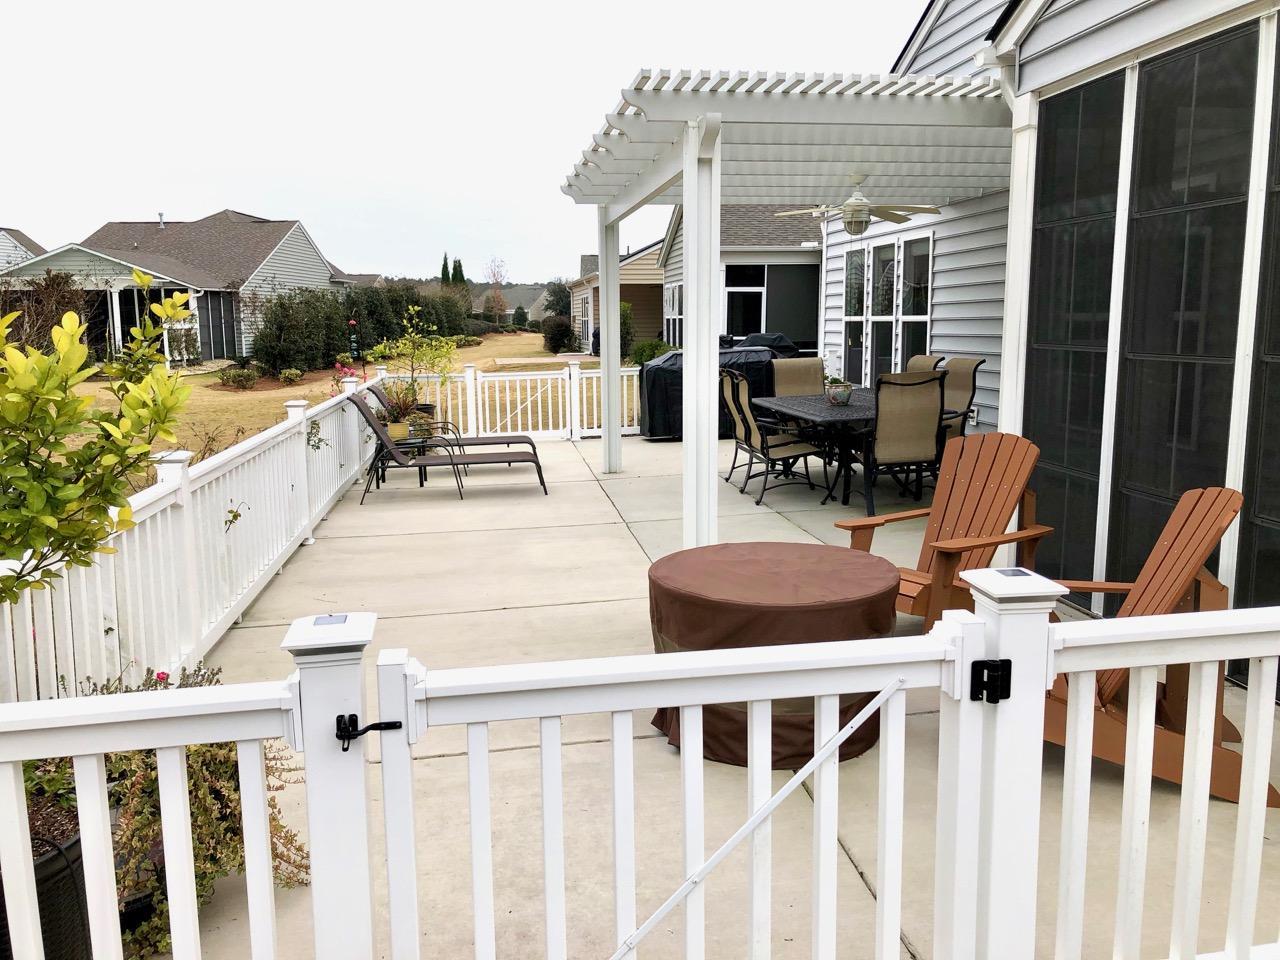 Cane Bay Plantation Homes For Sale - 419 Eastern Isle, Summerville, SC - 9